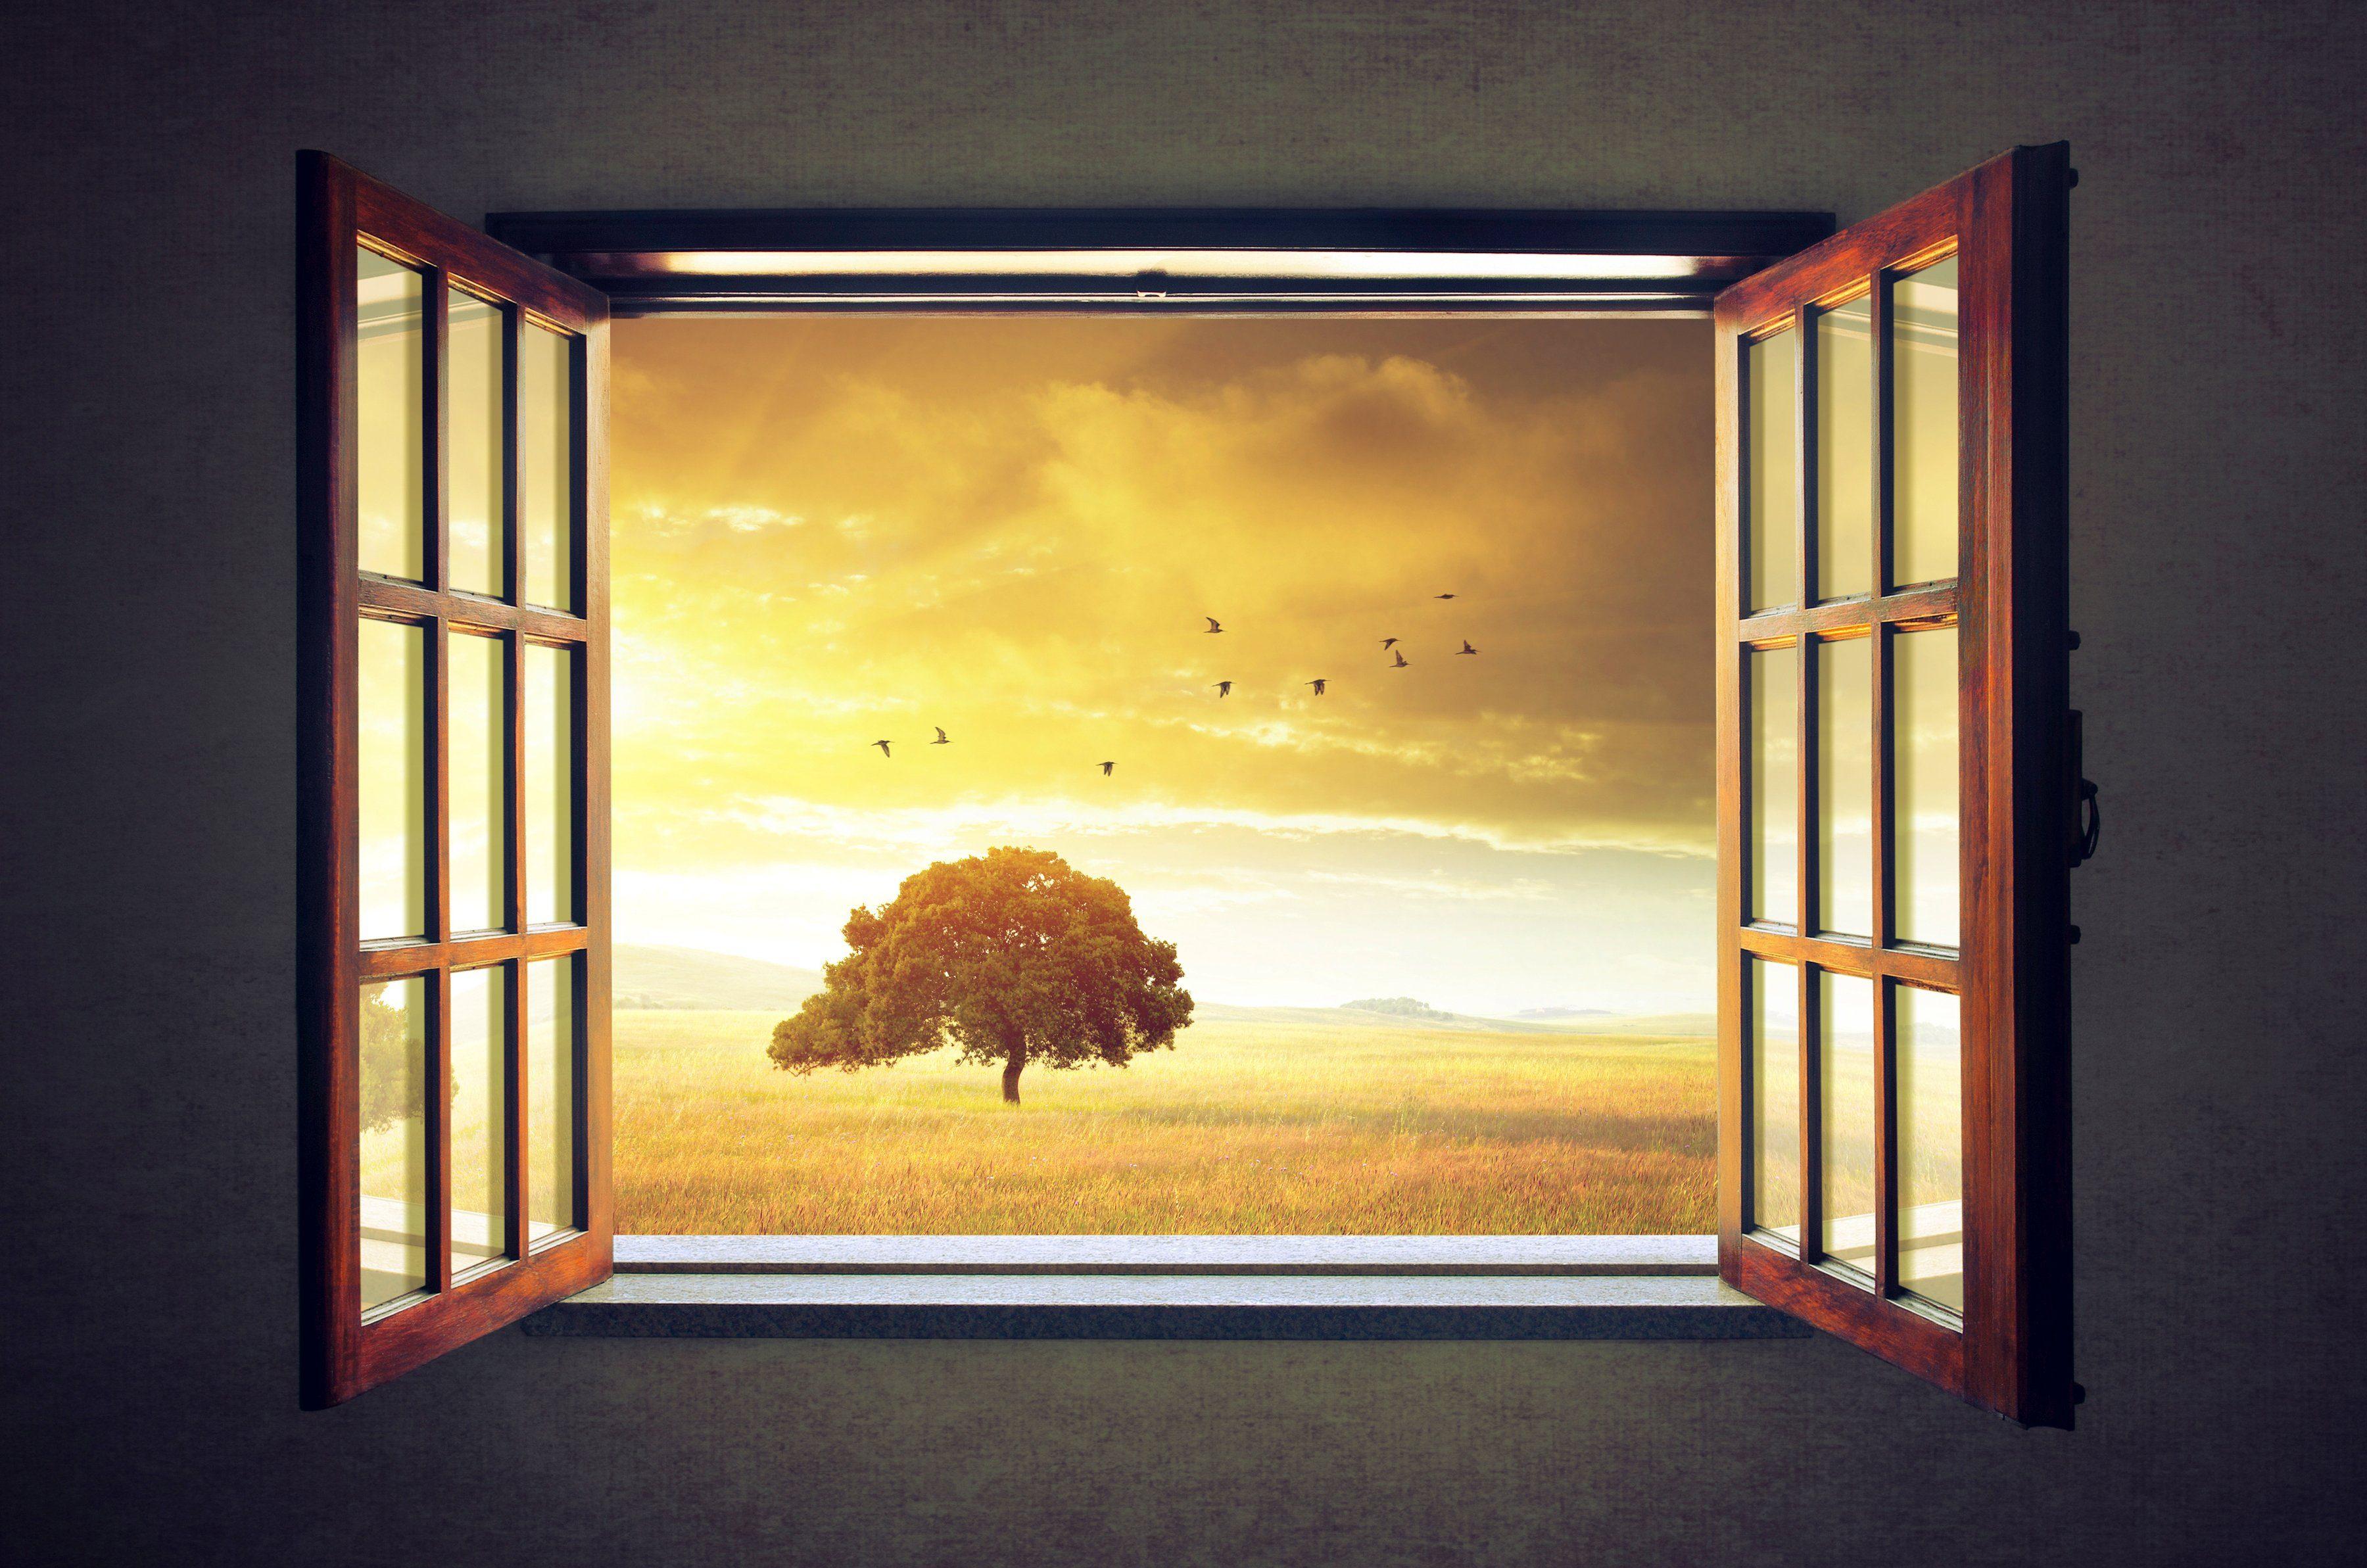 PAPERMOON Fototapete »Sunny Spring«, BlueBack, 7 Bahnen, 350 x 260 cm